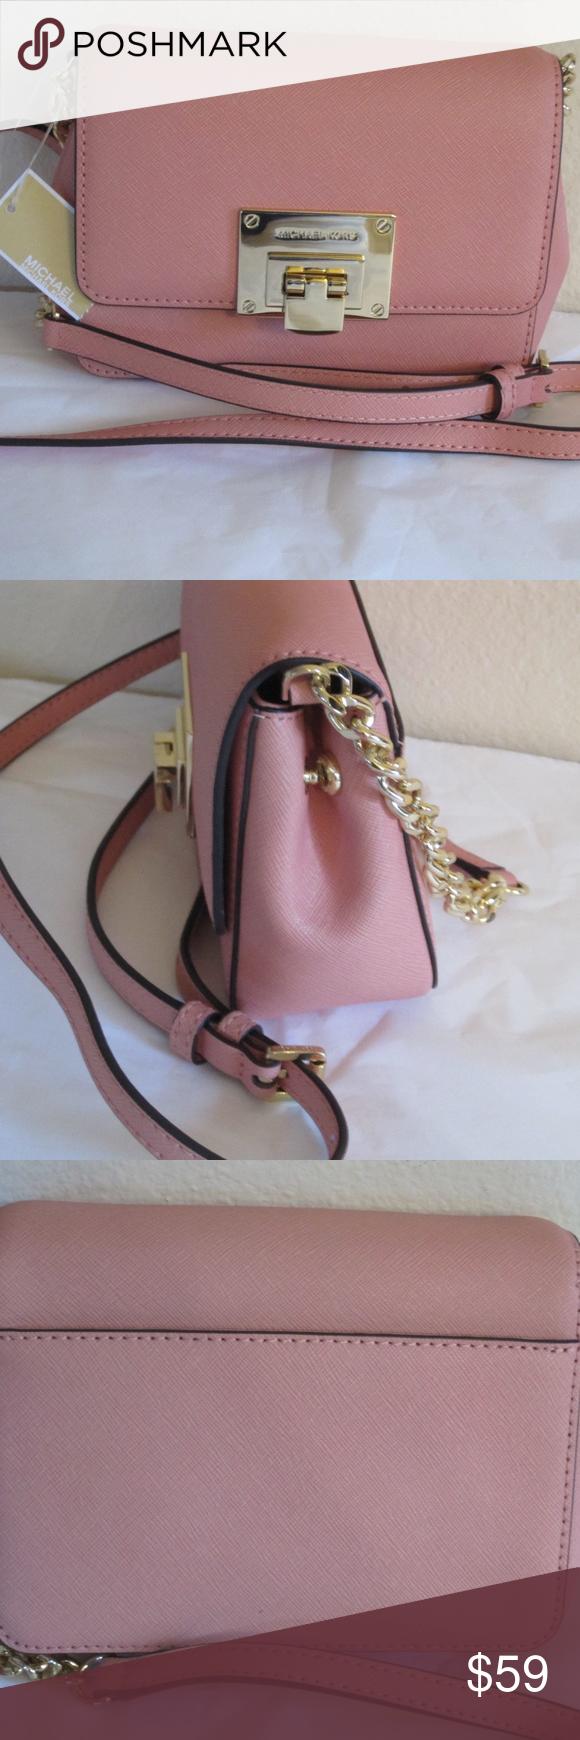 86a227eda Michael Kors Tina Saffiano Leather Peach Crossbody Michael Kors Tina Small  Crossbody Convertible Clutch Bag NWT